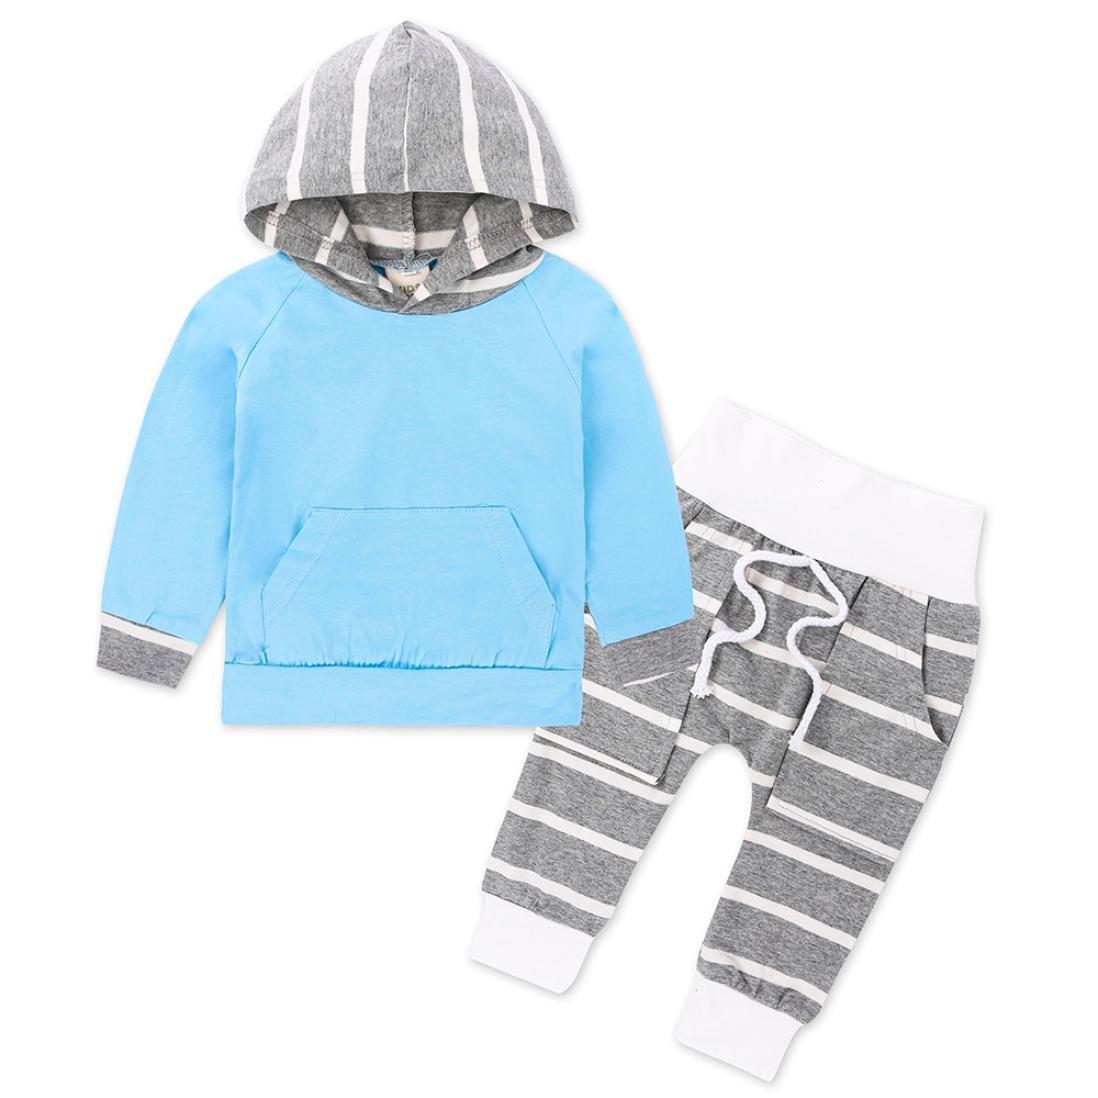 QinMM Baby Kleidung Satz, Kleinkind Säuglingsbaby Kleidung stellte Gestreifte Hoodie Tops + Pants Outfits Set 2pcs 0-18 Monat 11222